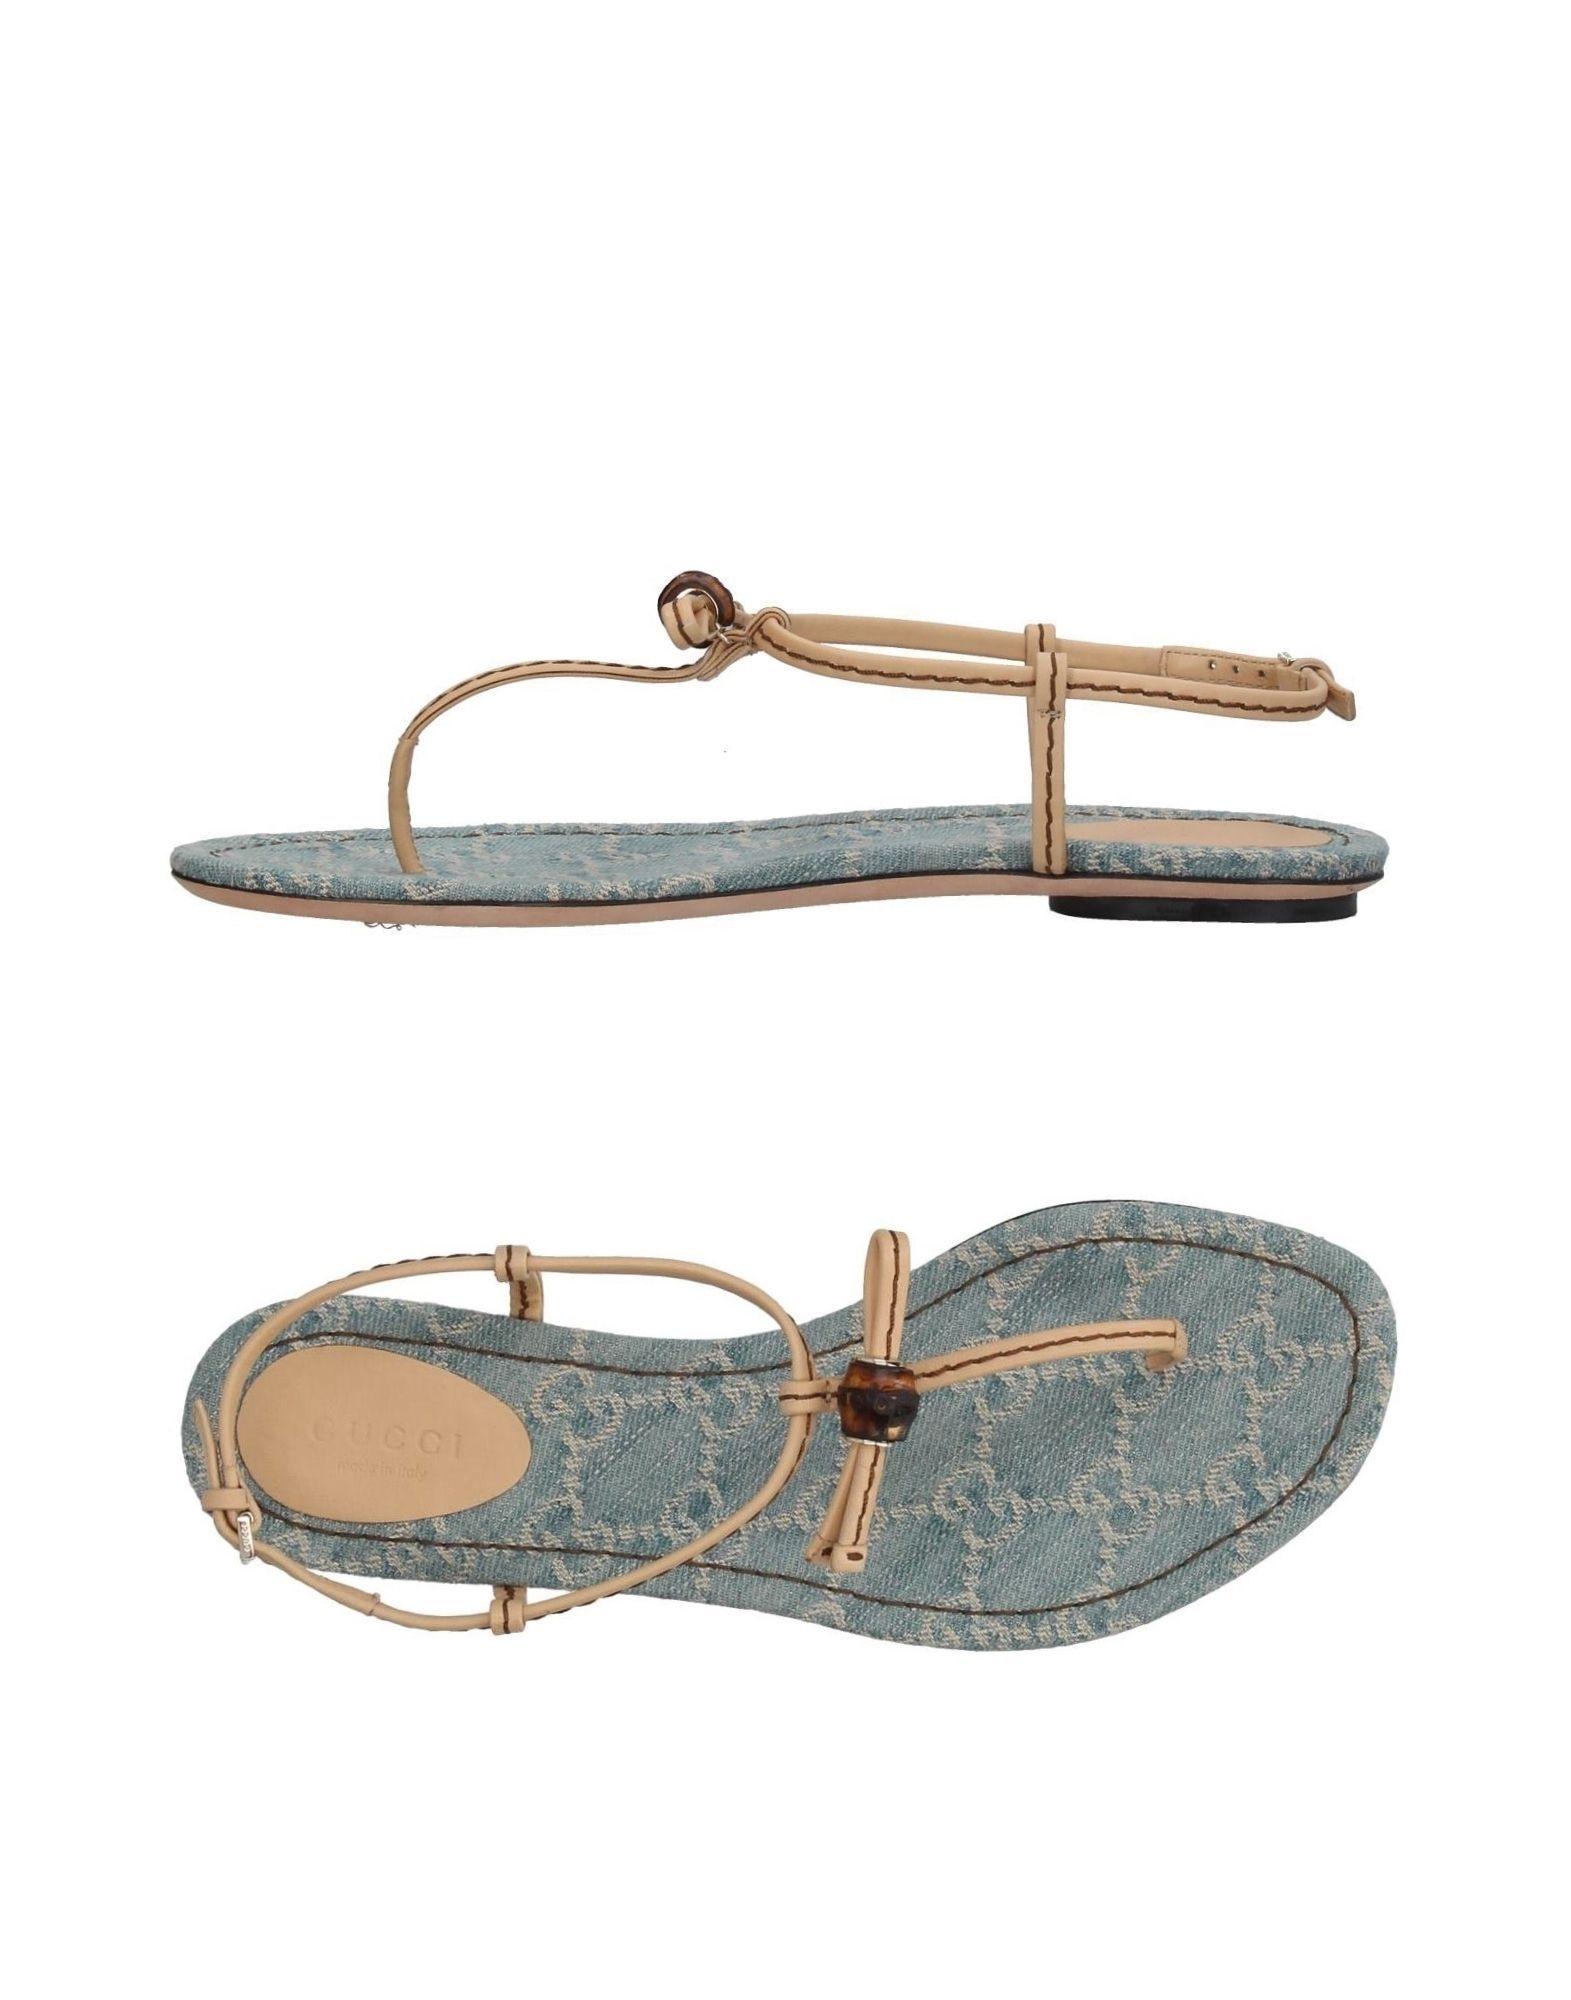 a08959968b47 Gucci Flip Flops - Women Gucci Flip Flops online on YOOX Philippines -  11390808SJ